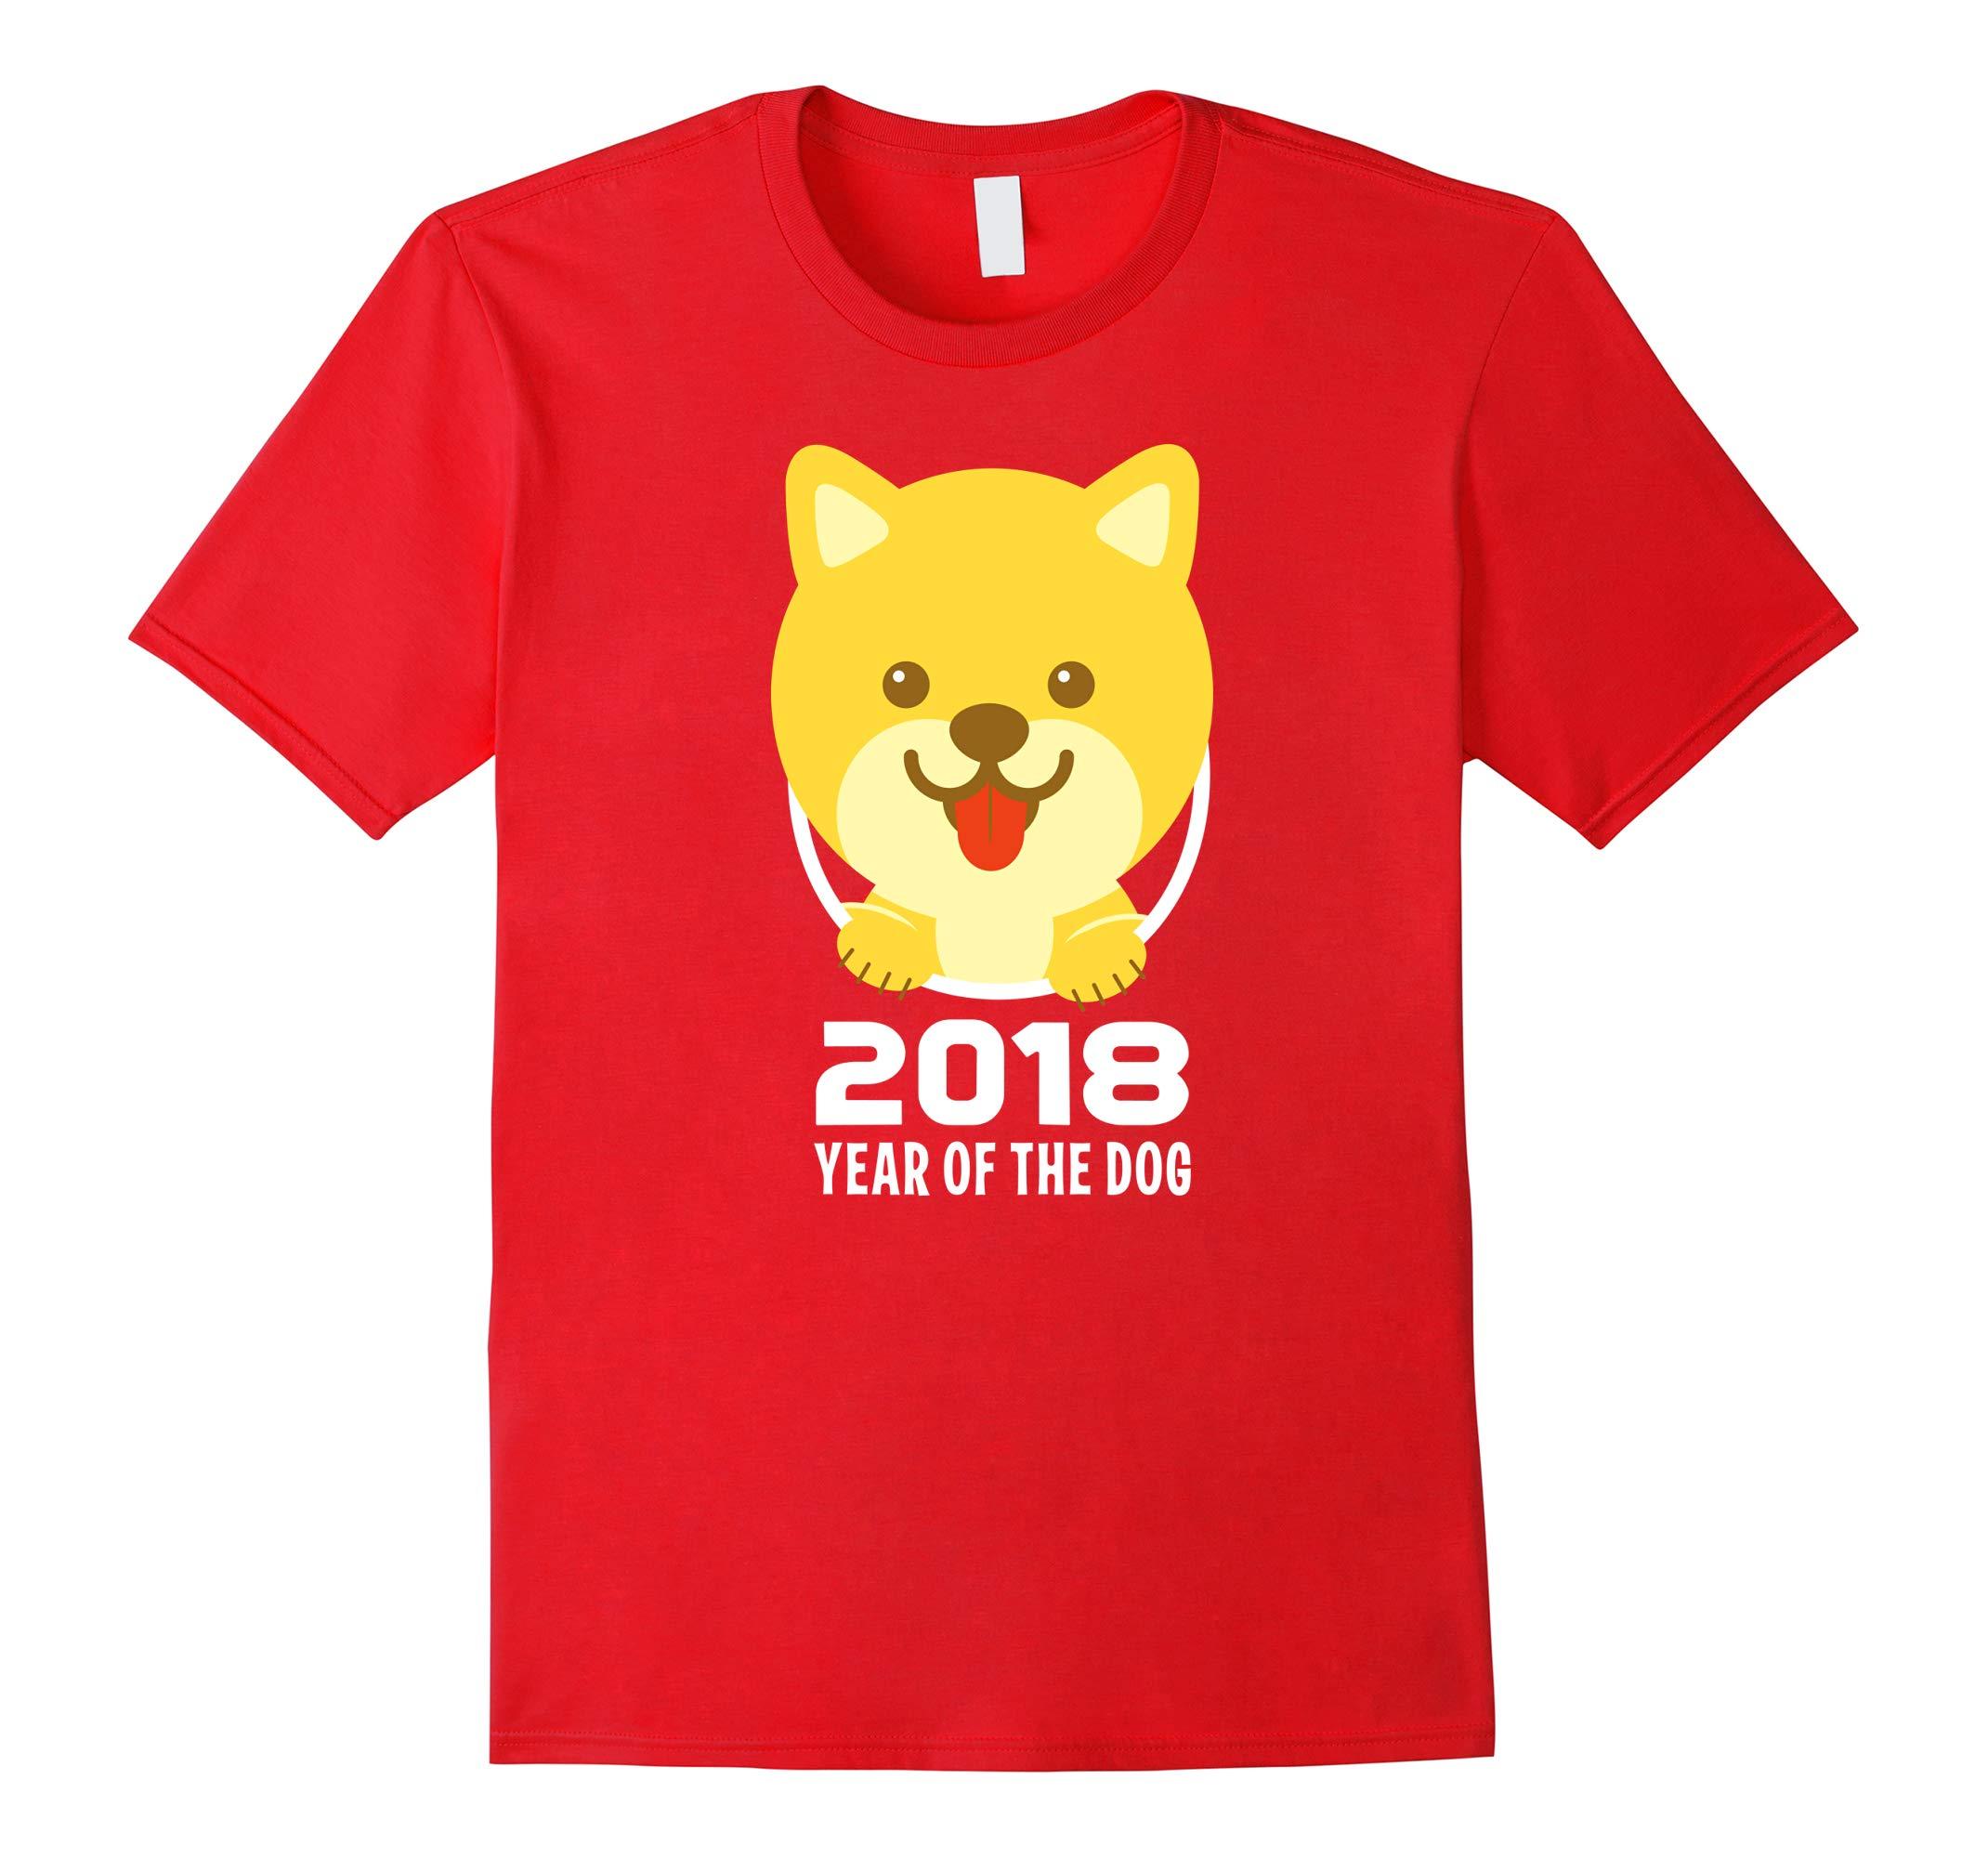 Year of the Dog 2018 Shiba Inu Shirt Chinese New Year-RT